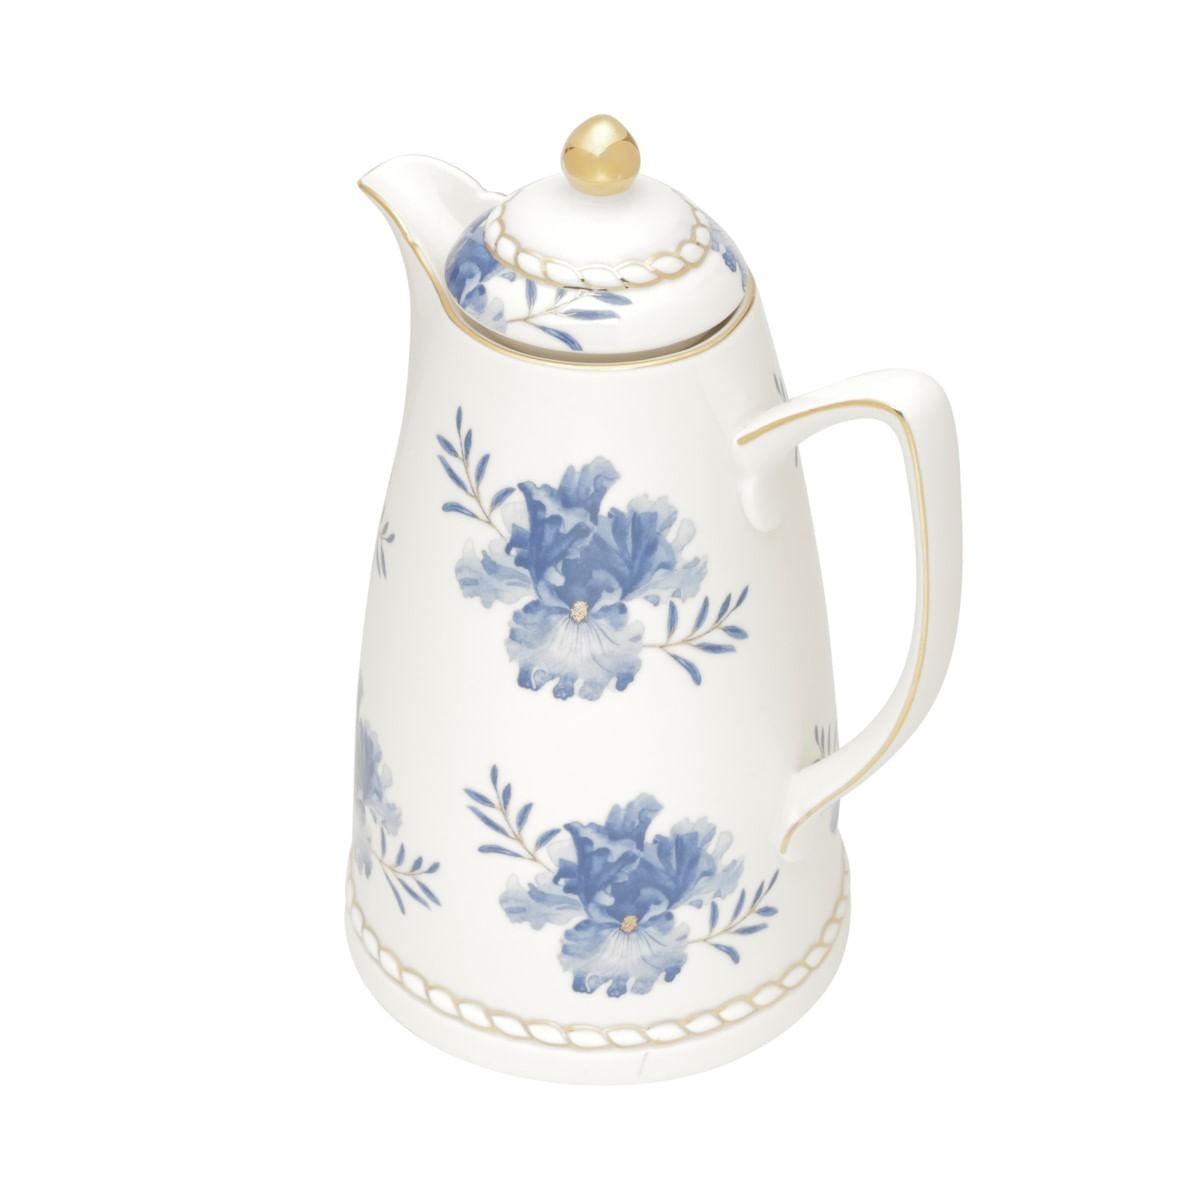 Garrafa Térmica De Porcelana Flores Azuis e Dourado 900ml